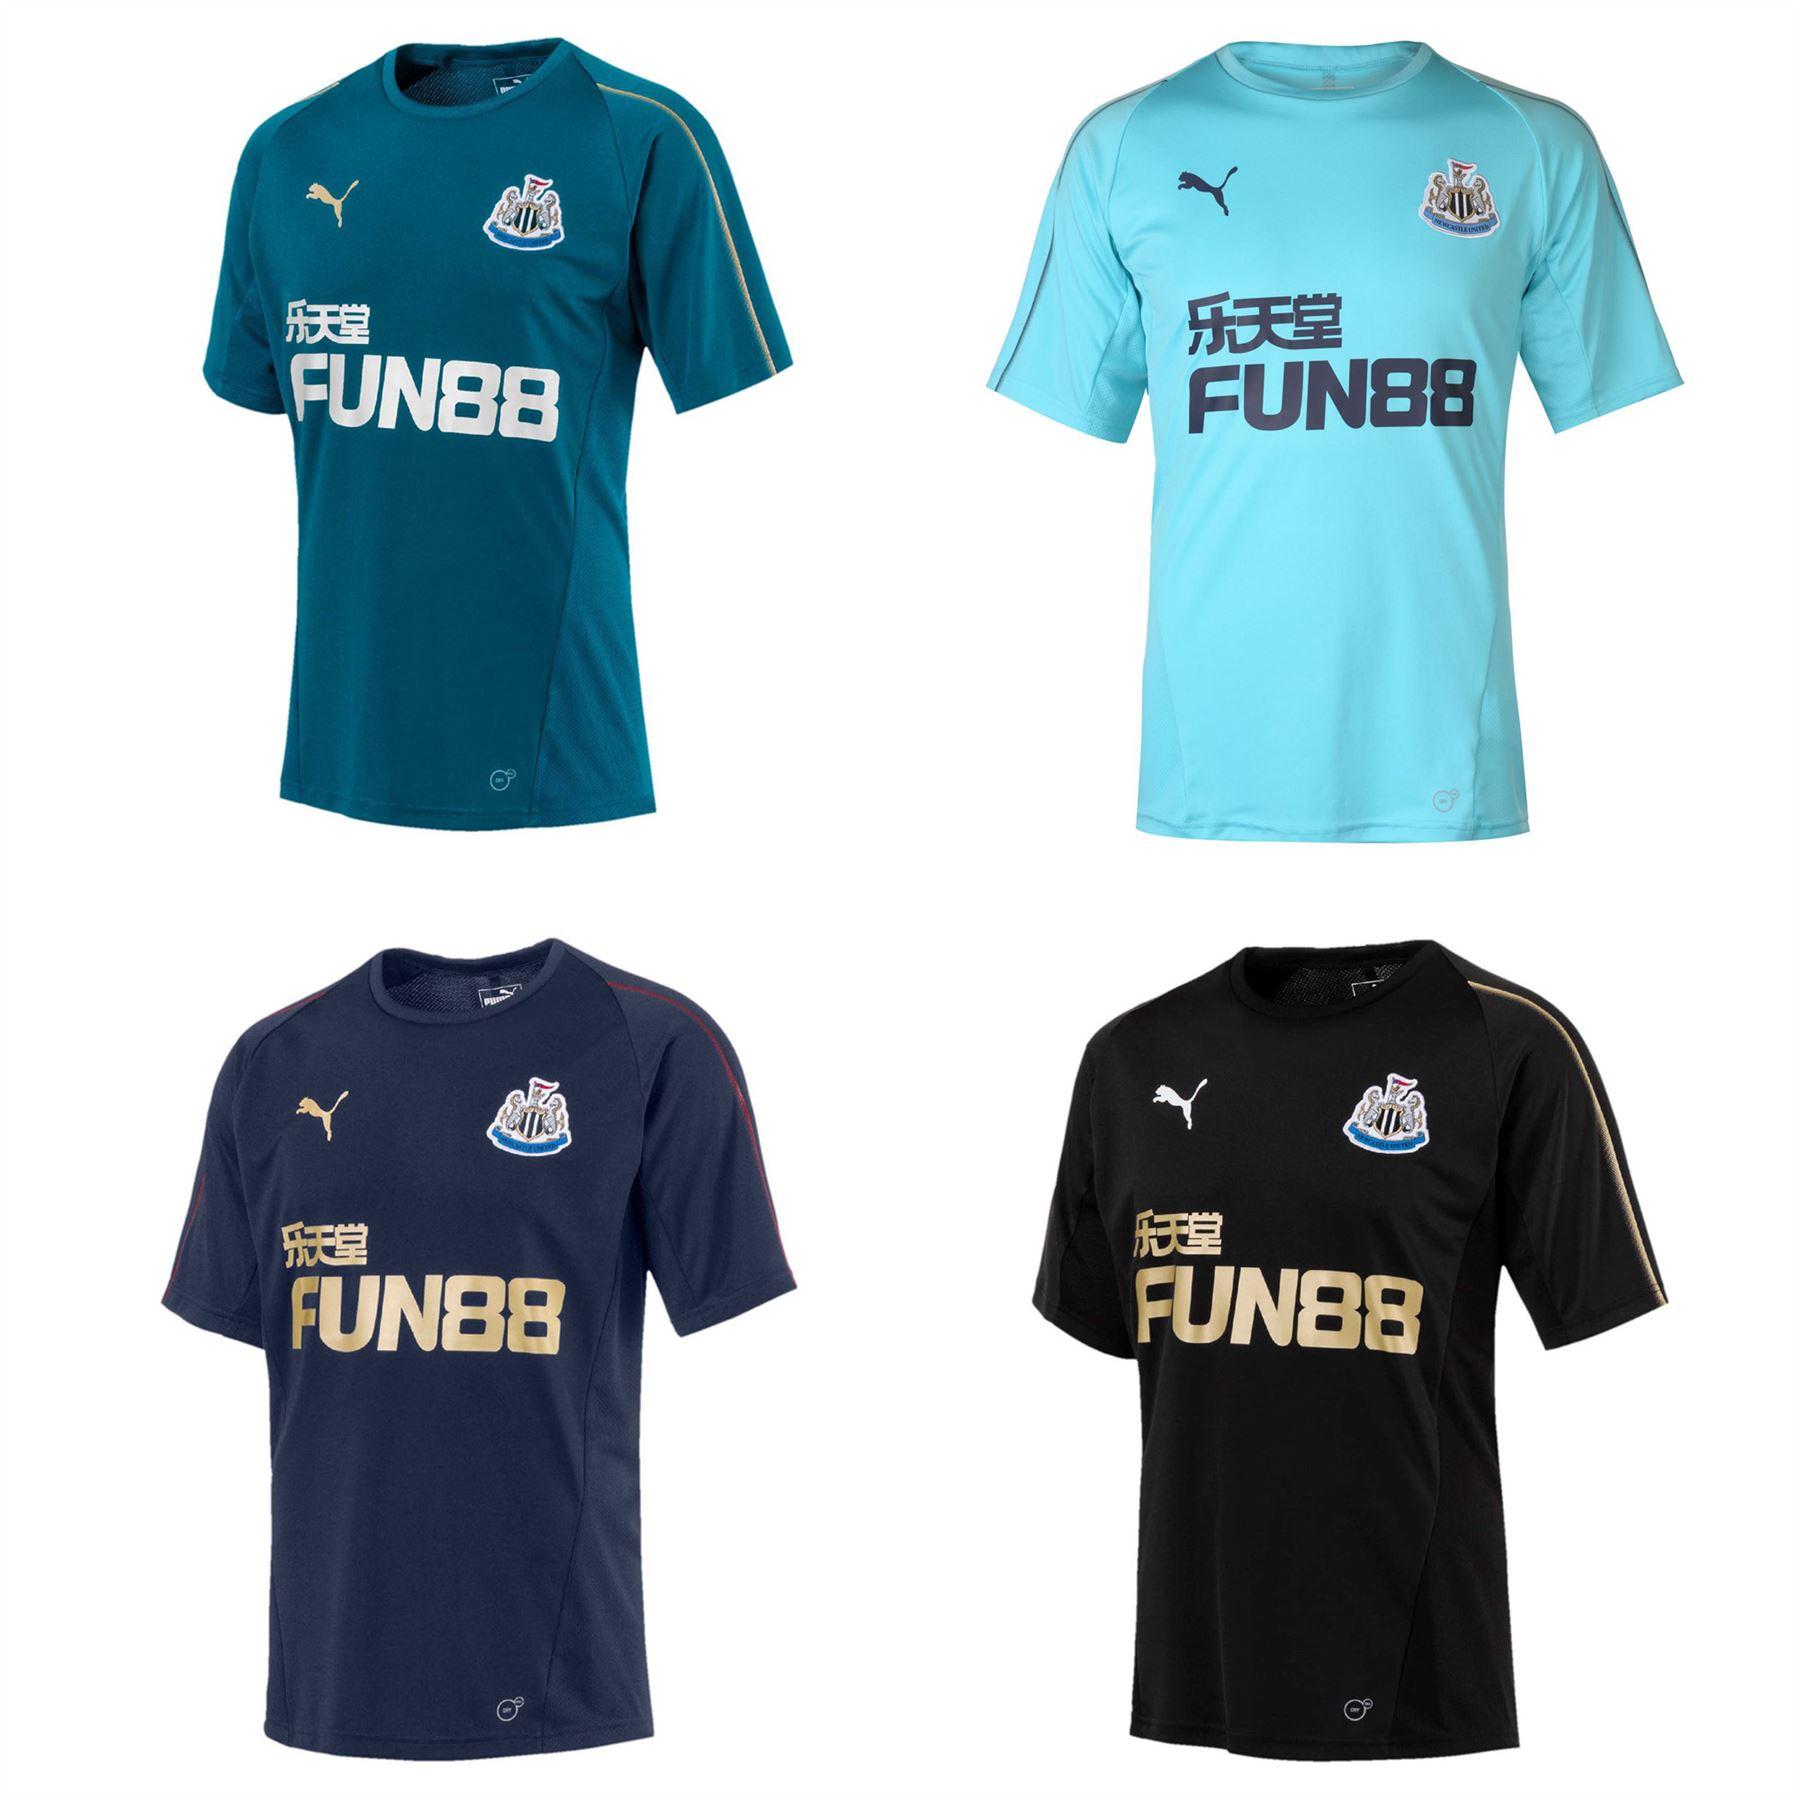 ... Puma Newcastle United Training Jersey 2018 2019 Football Soccer Shirt  Top Tee ... c7cd8935a